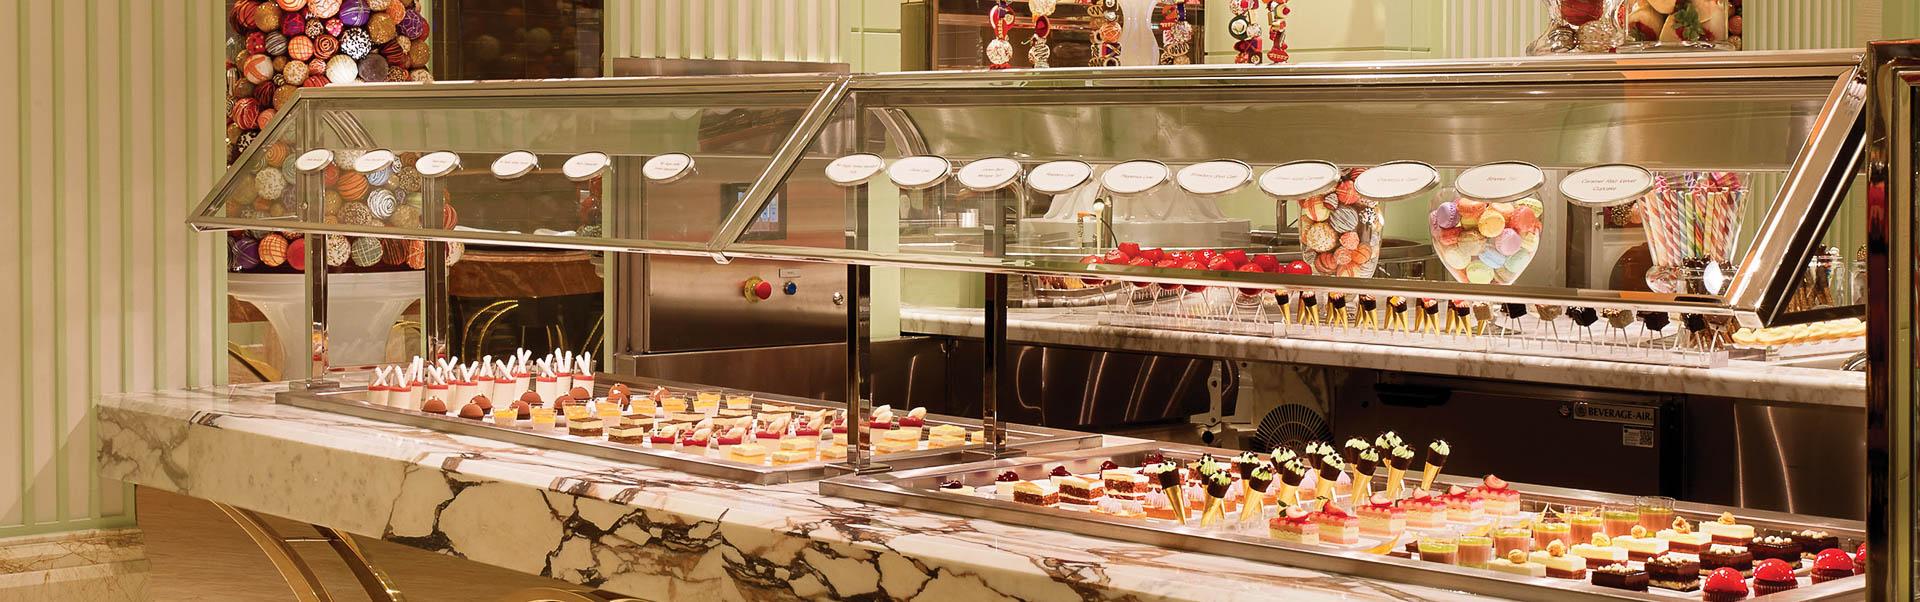 Wide spread of sushi at the Las Vegas Wynn Buffet